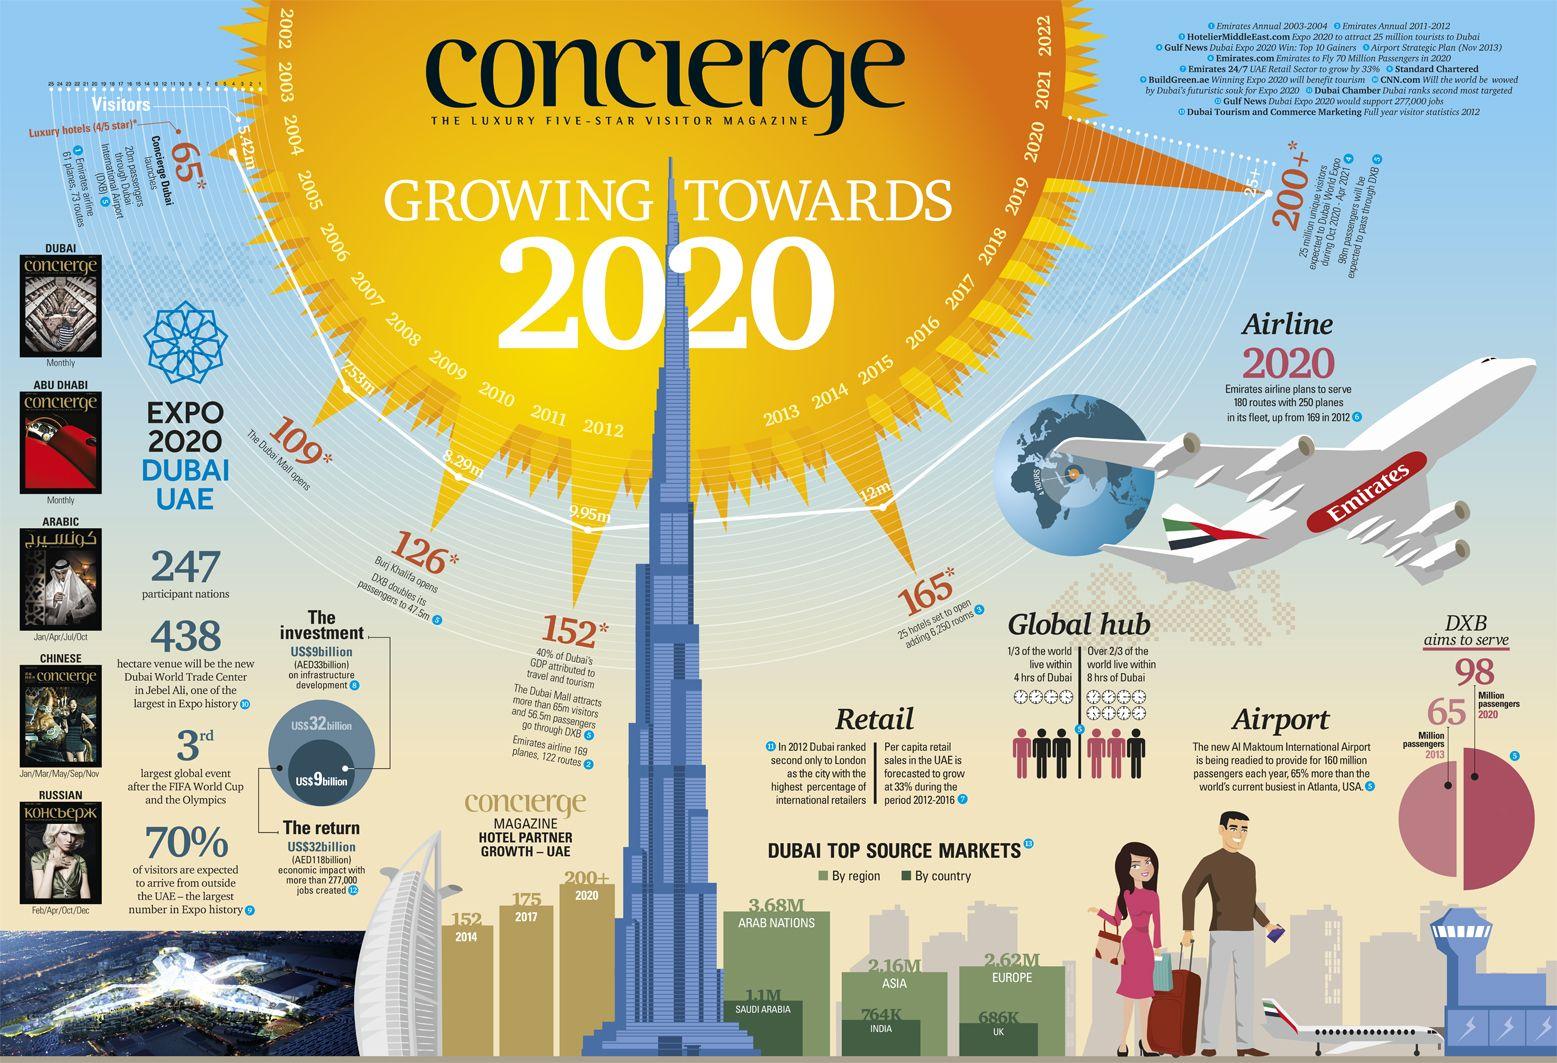 Growing Dubai towards 2020 | Travel Infographic | Expo 2020, Dubai